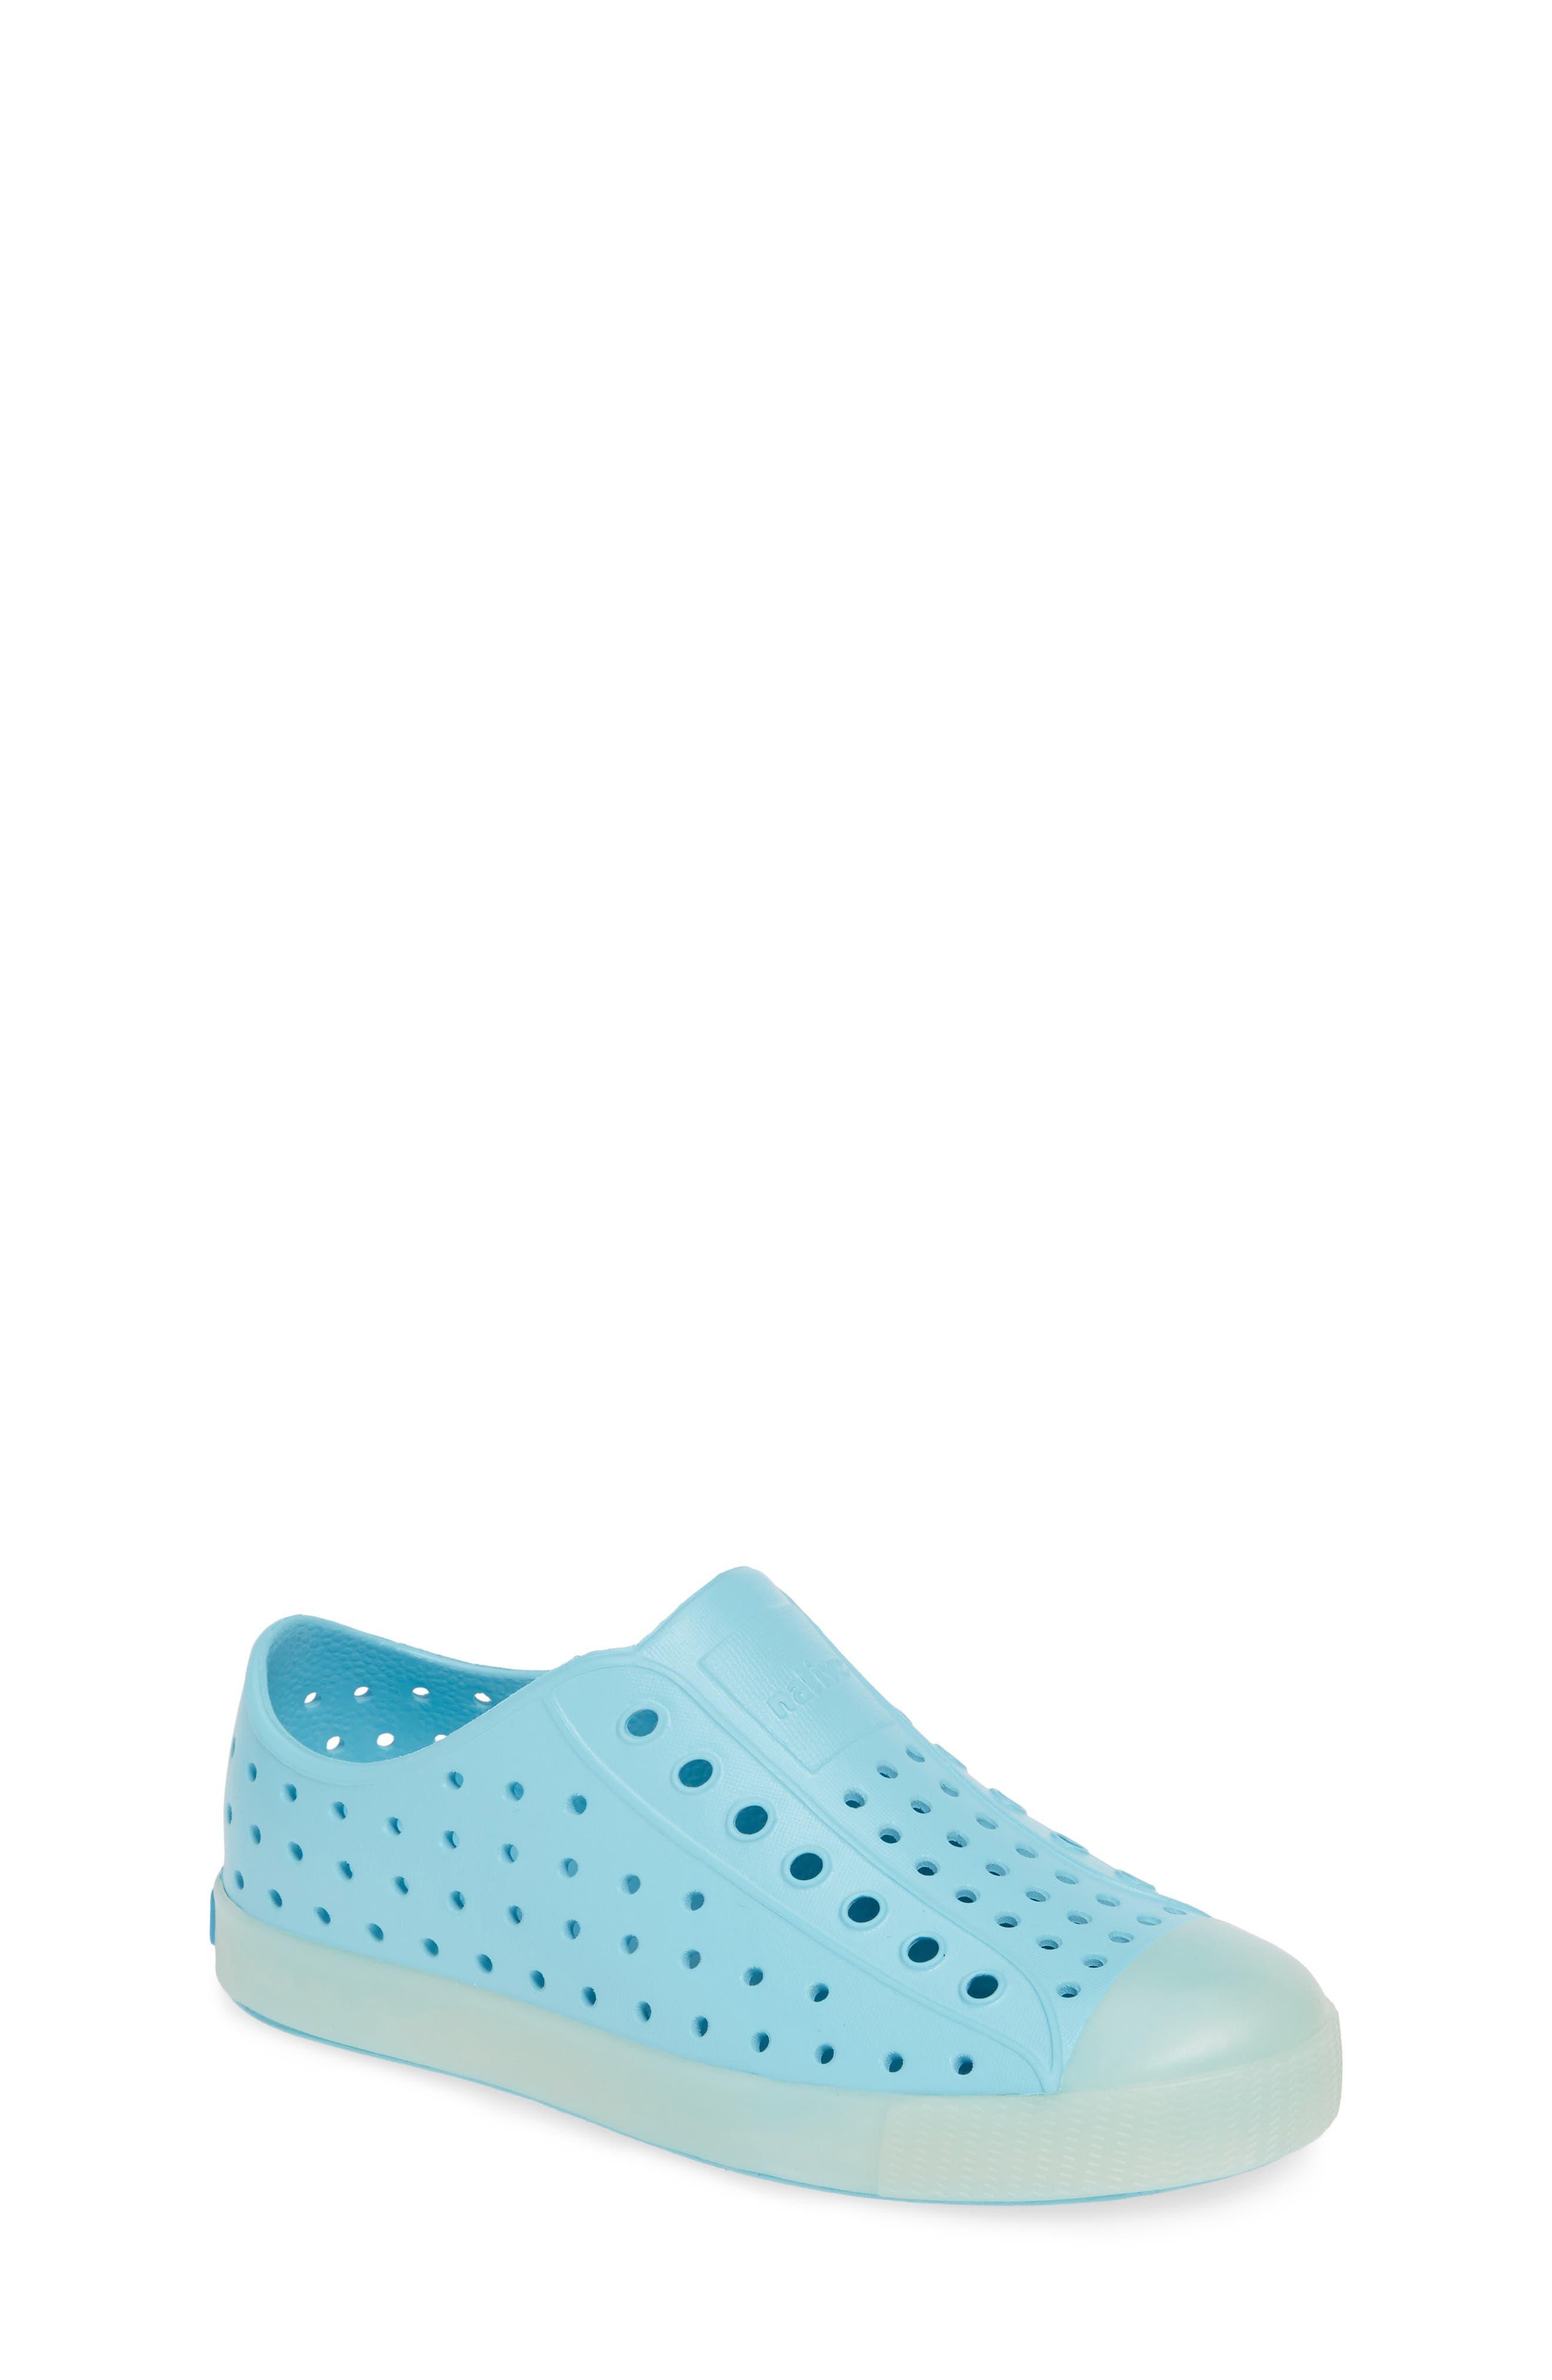 aaa816544 Native Shoes